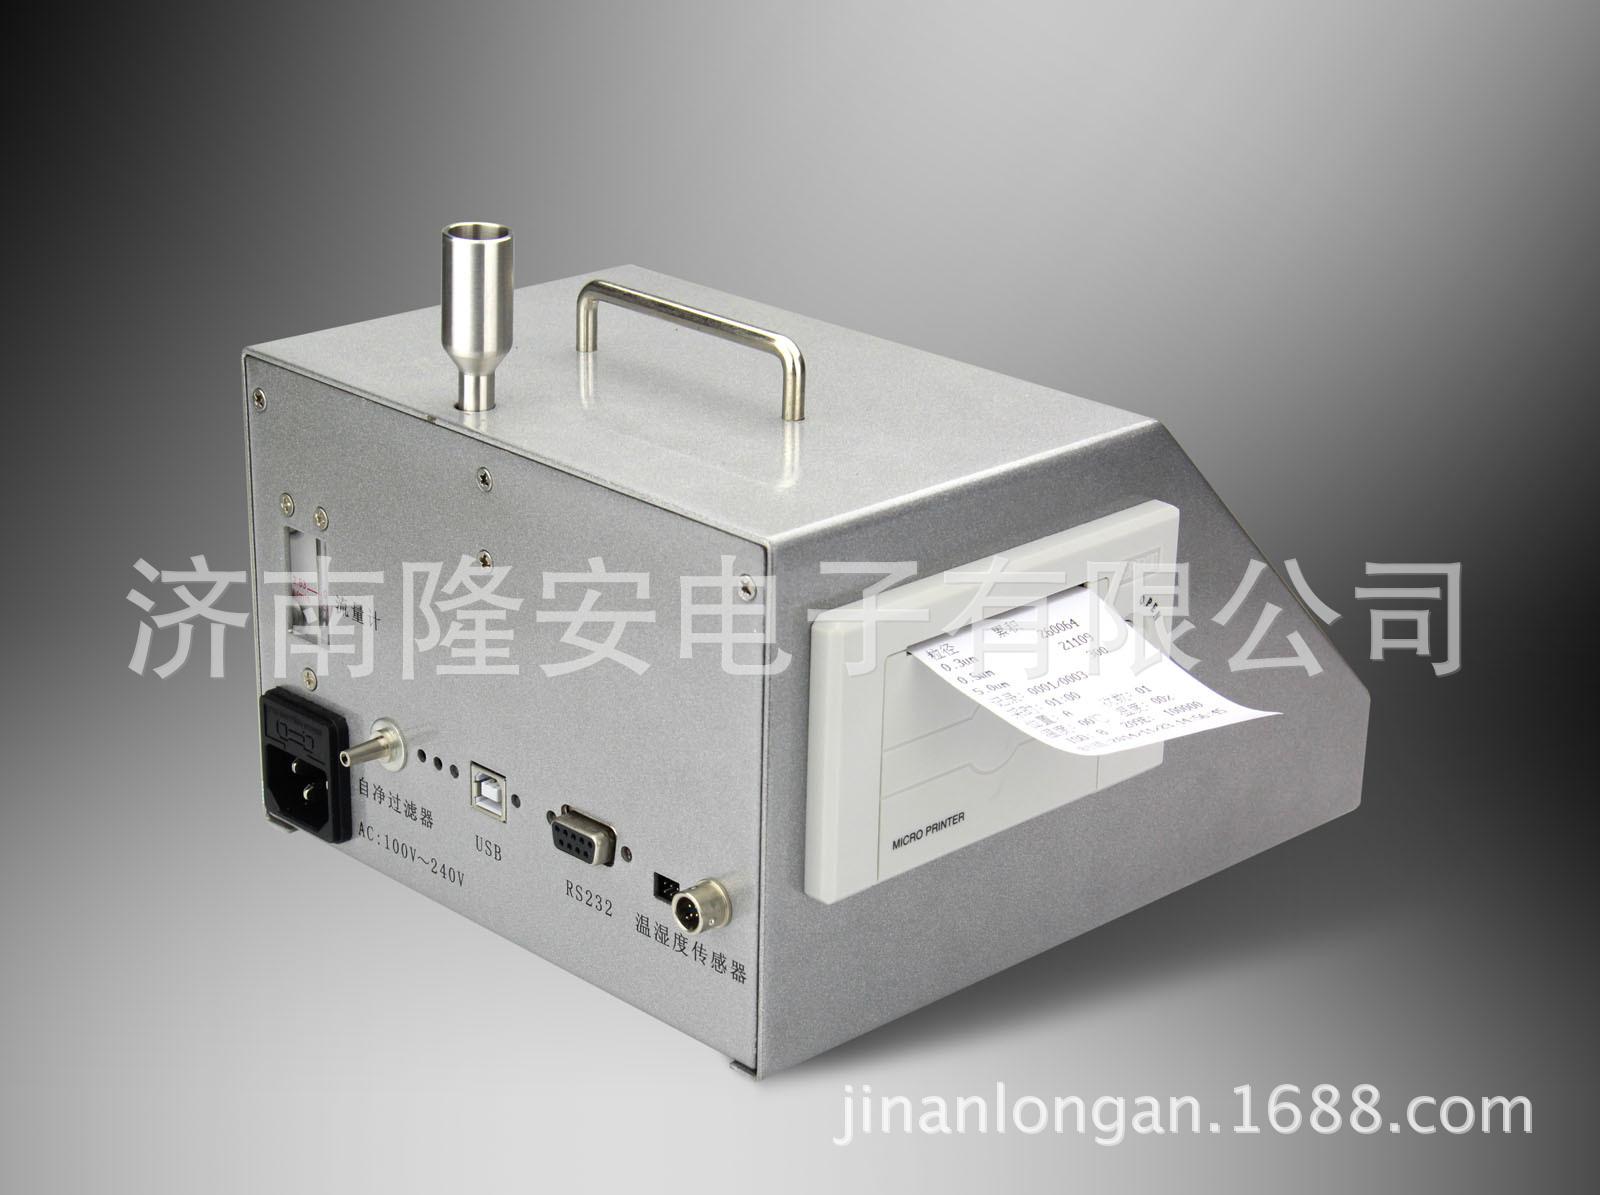 CW-PPC300三通道高精度便携式激光尘埃粒子计数器 洁净环境检测仪